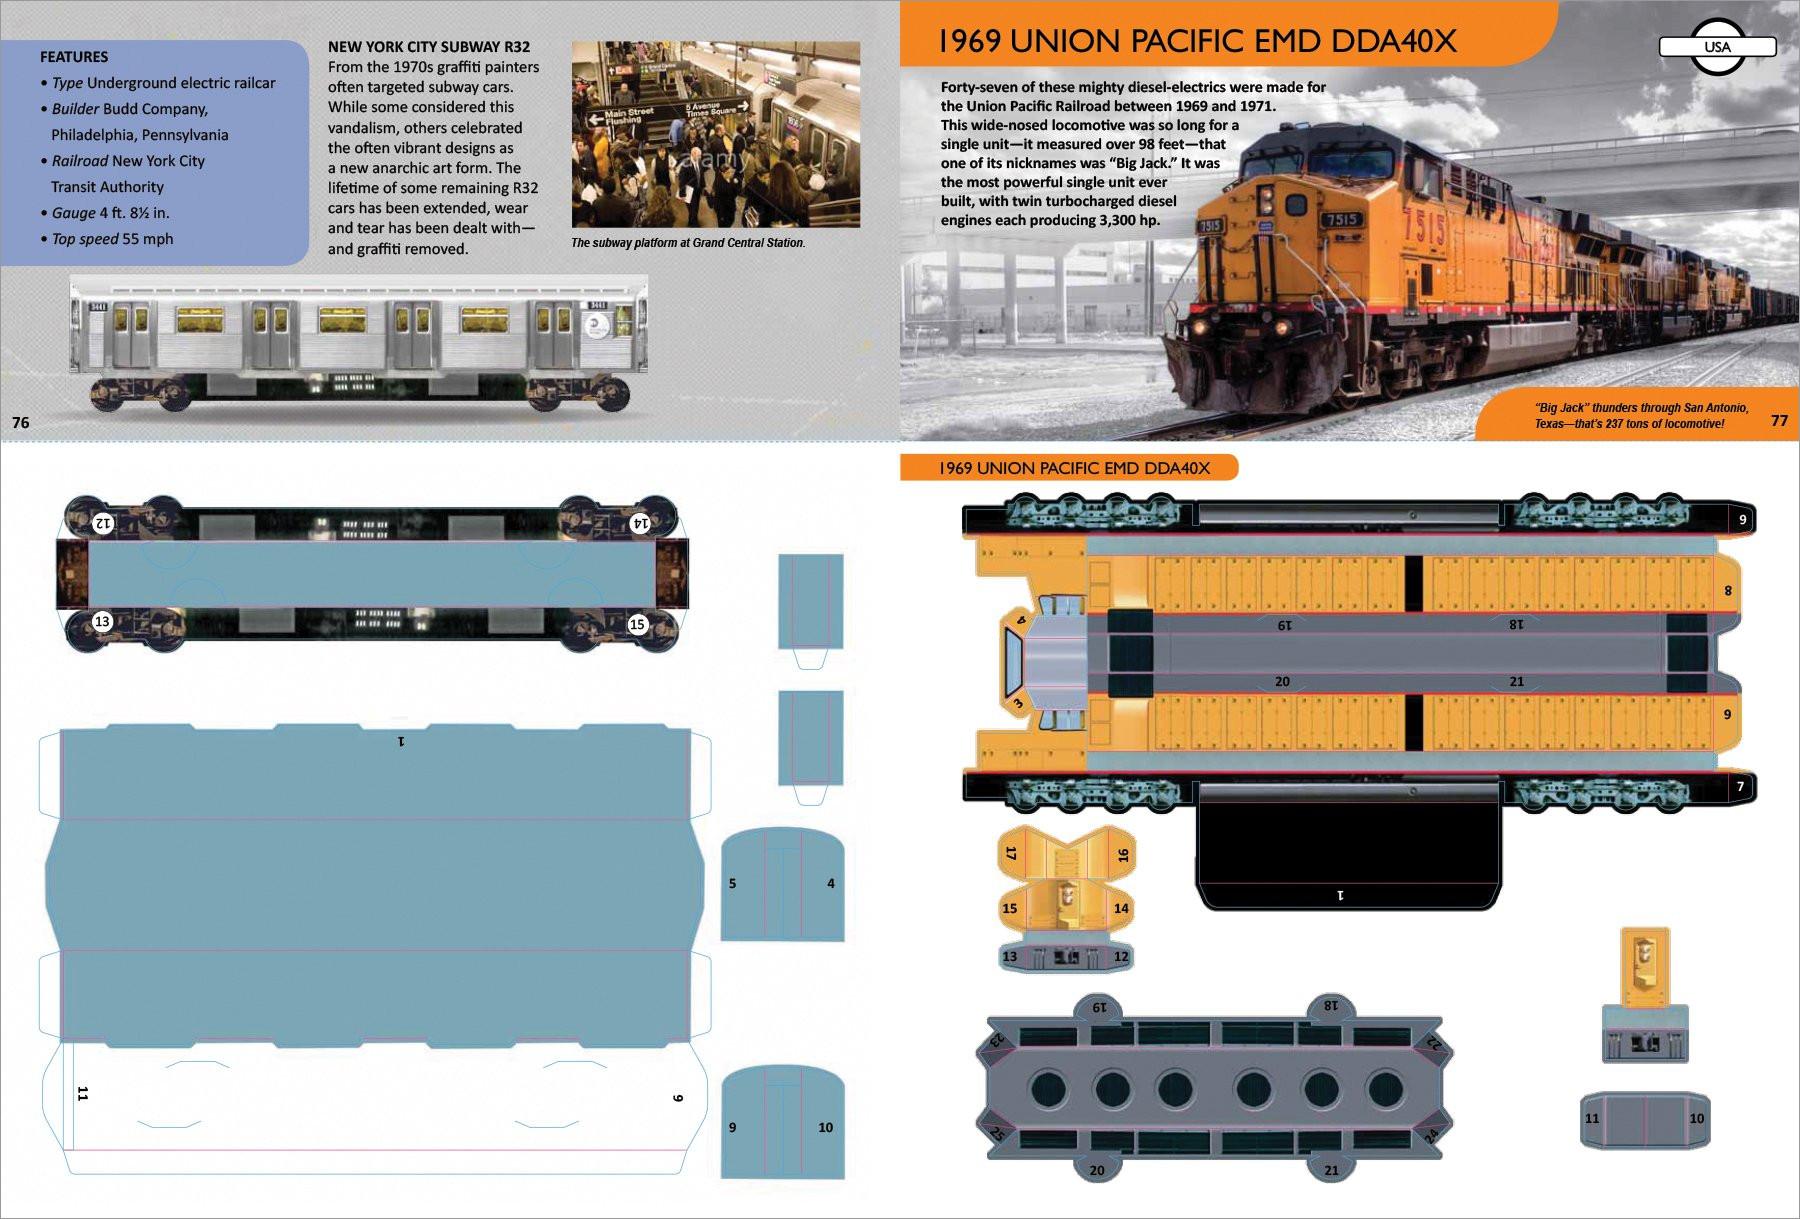 Train Papercraft 1969 Union Pacific Emd Dda40x Train Papercraft